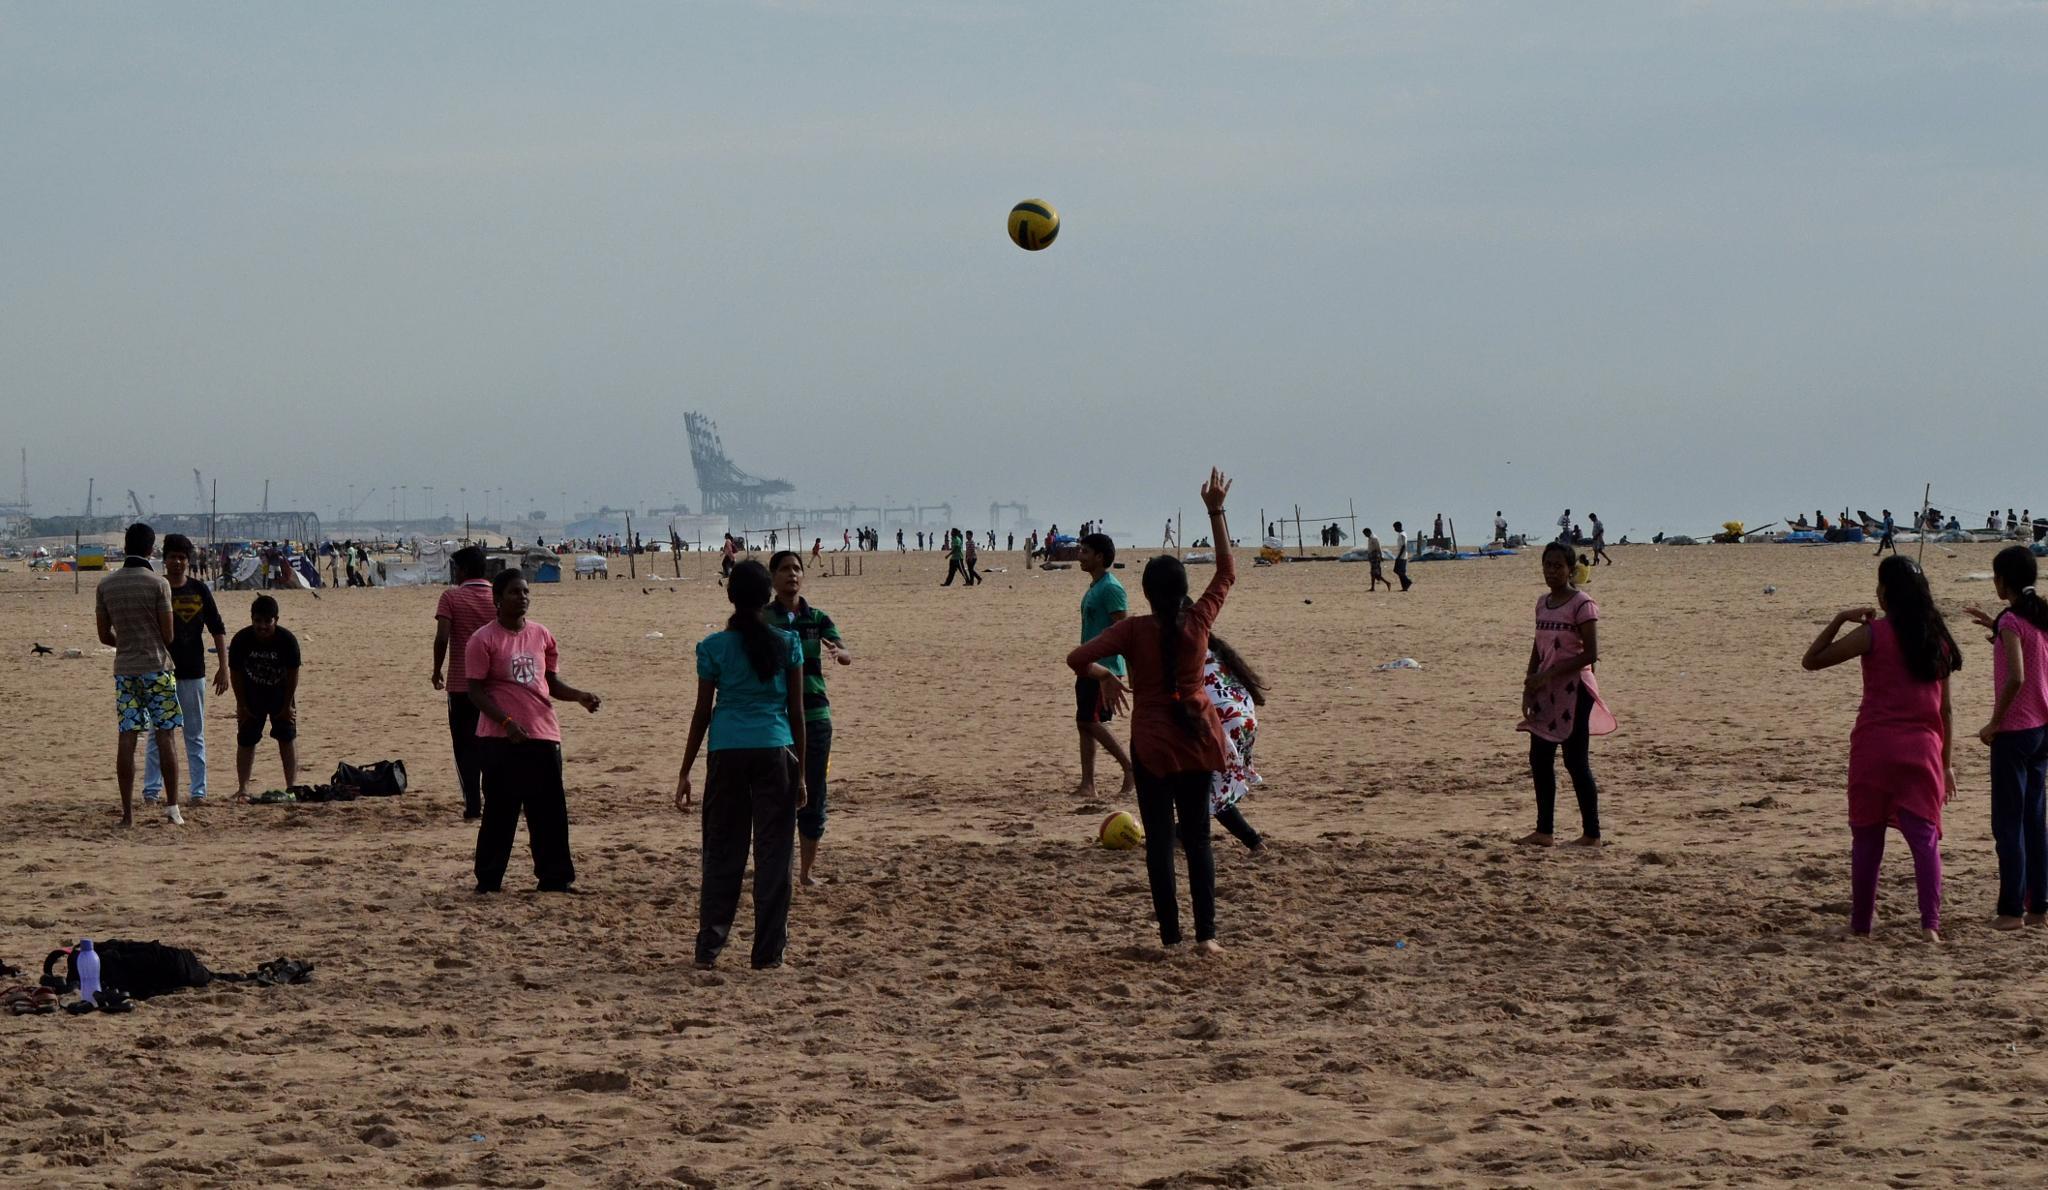 Beach by Radhamadhavan K S